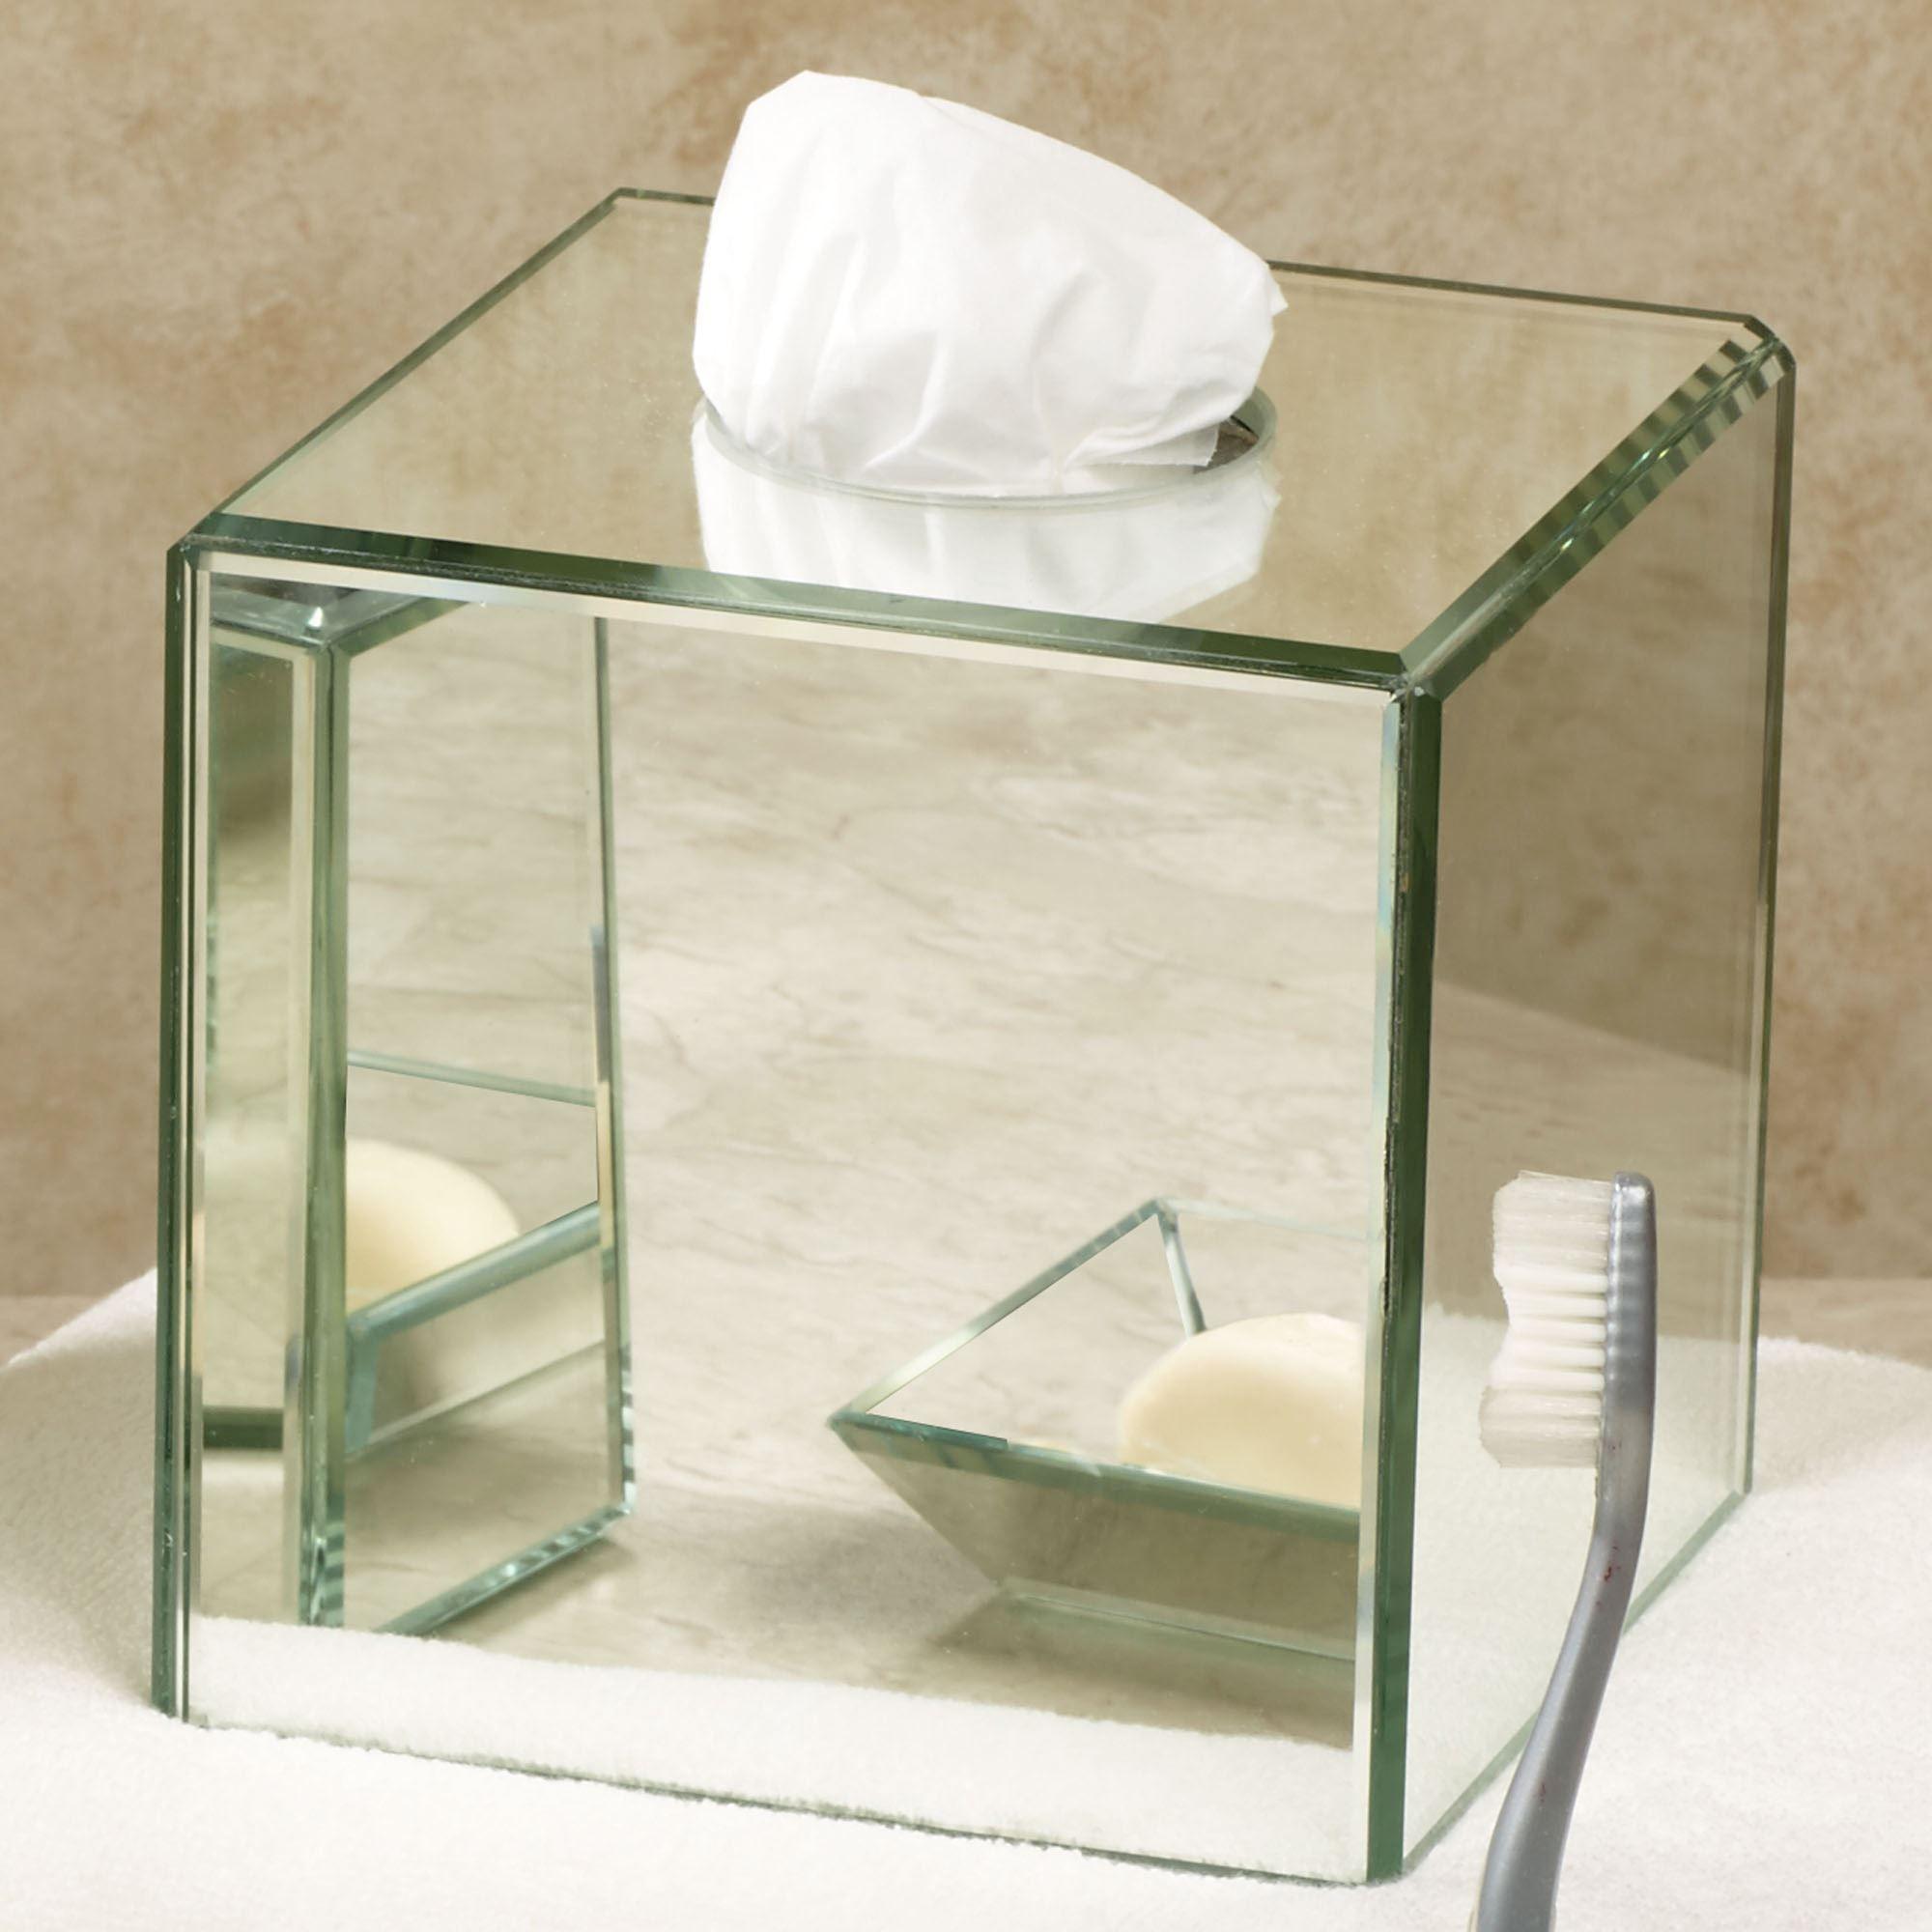 Crystal mirror bath accessories for Mirrored bathroom set